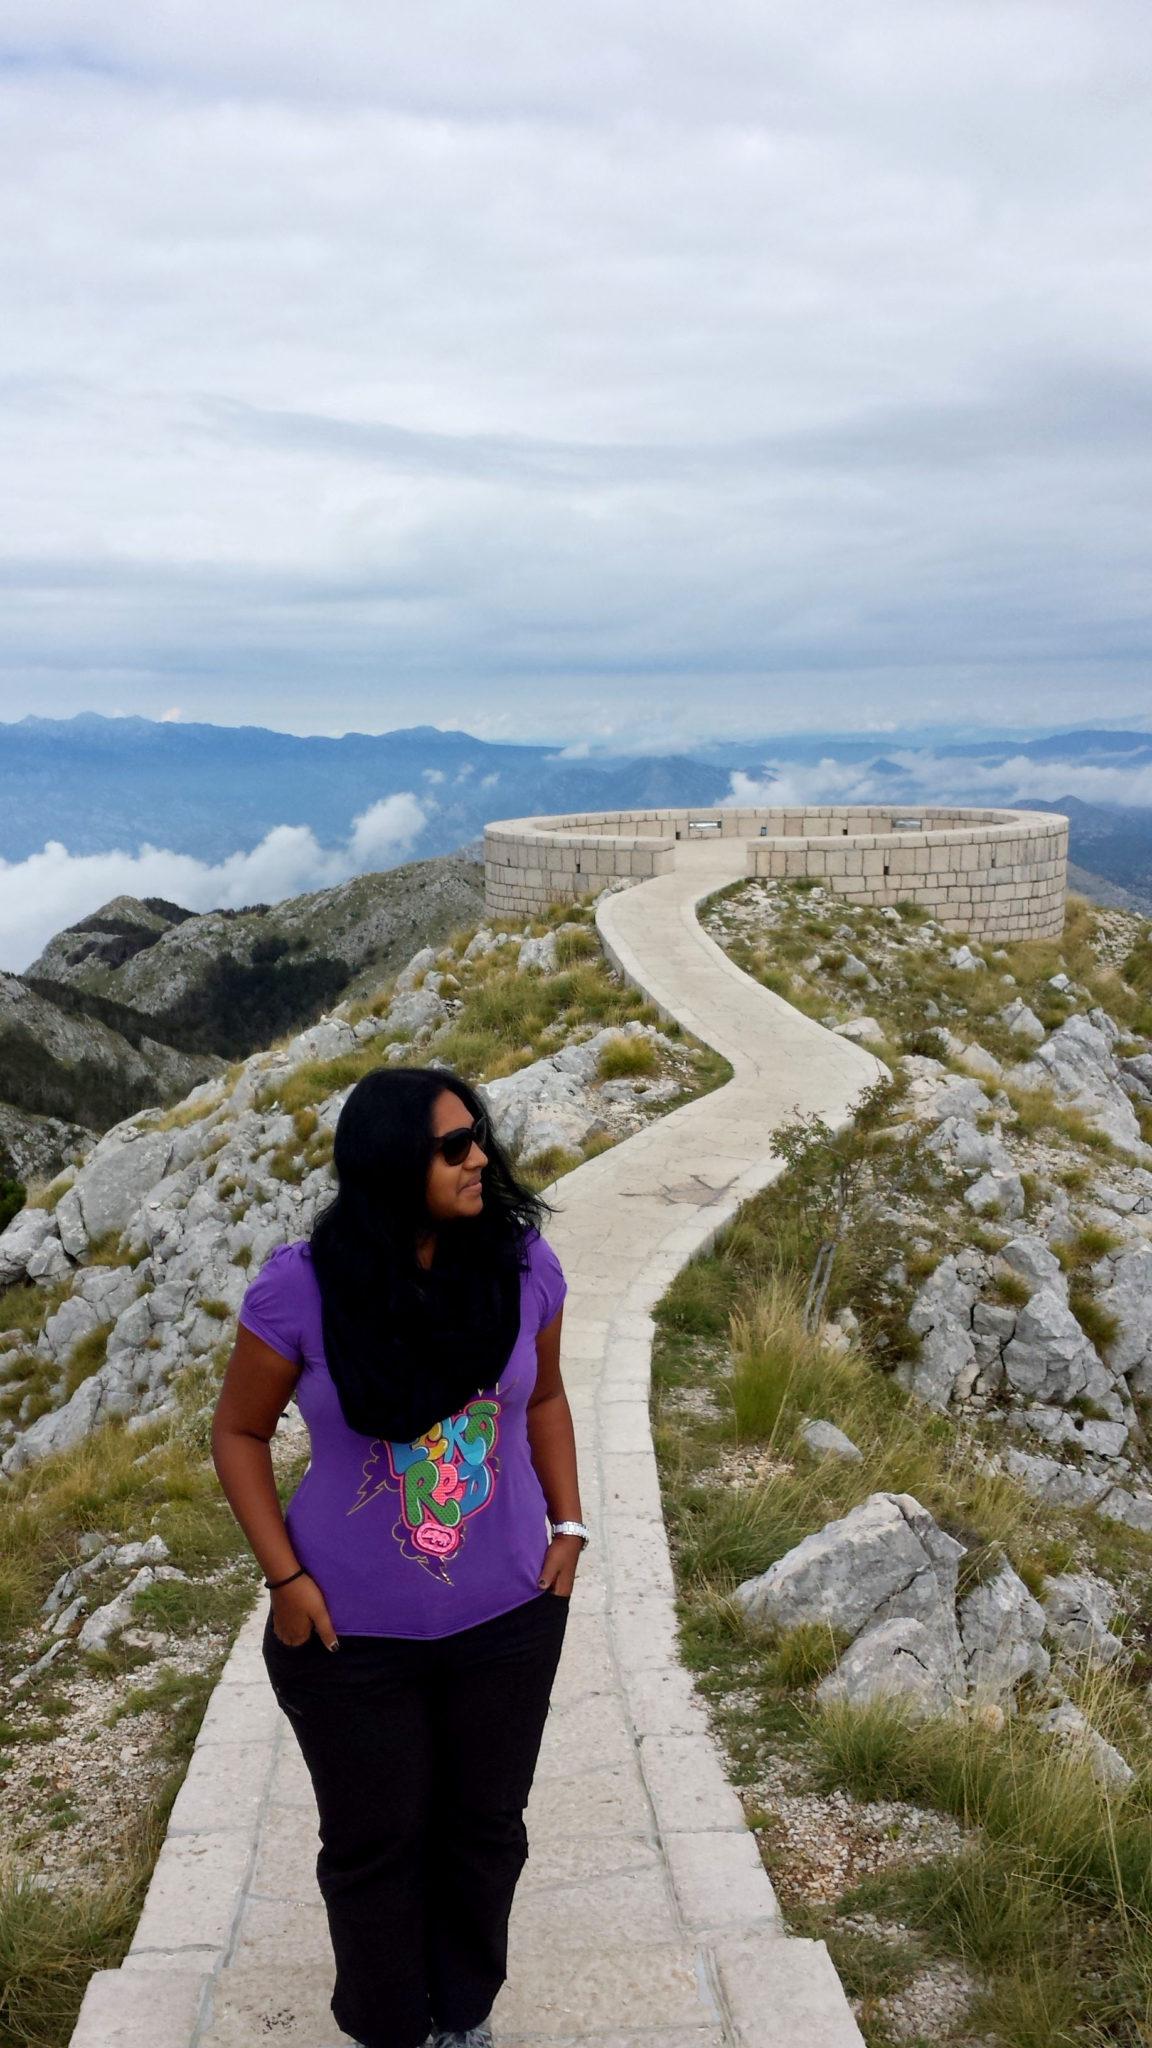 Hema_Le_parc_Lovcen_blog_voyage_travel_mausolee_nejegos15